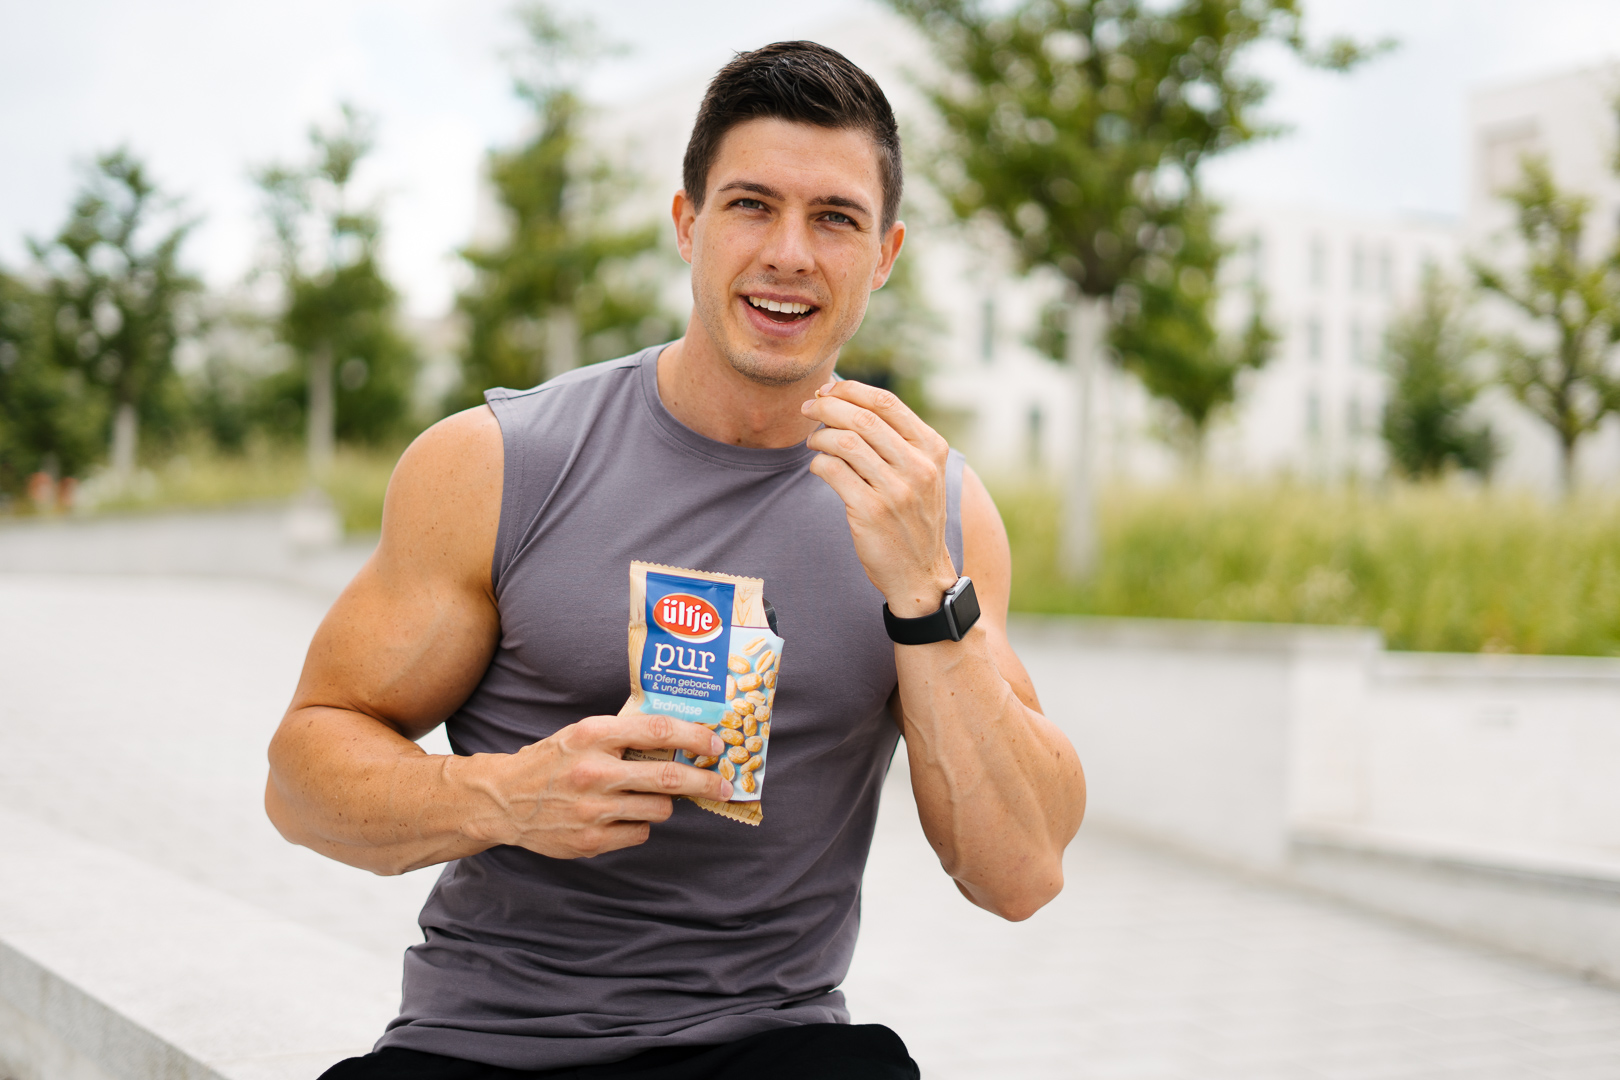 fitnessblog-fitnessblogger-fitness-blog-blogger-stuttgart-dreamteamfitness-erdnuss-gesunde-eigenschaften-ültje-gesunde-fette-proteineis